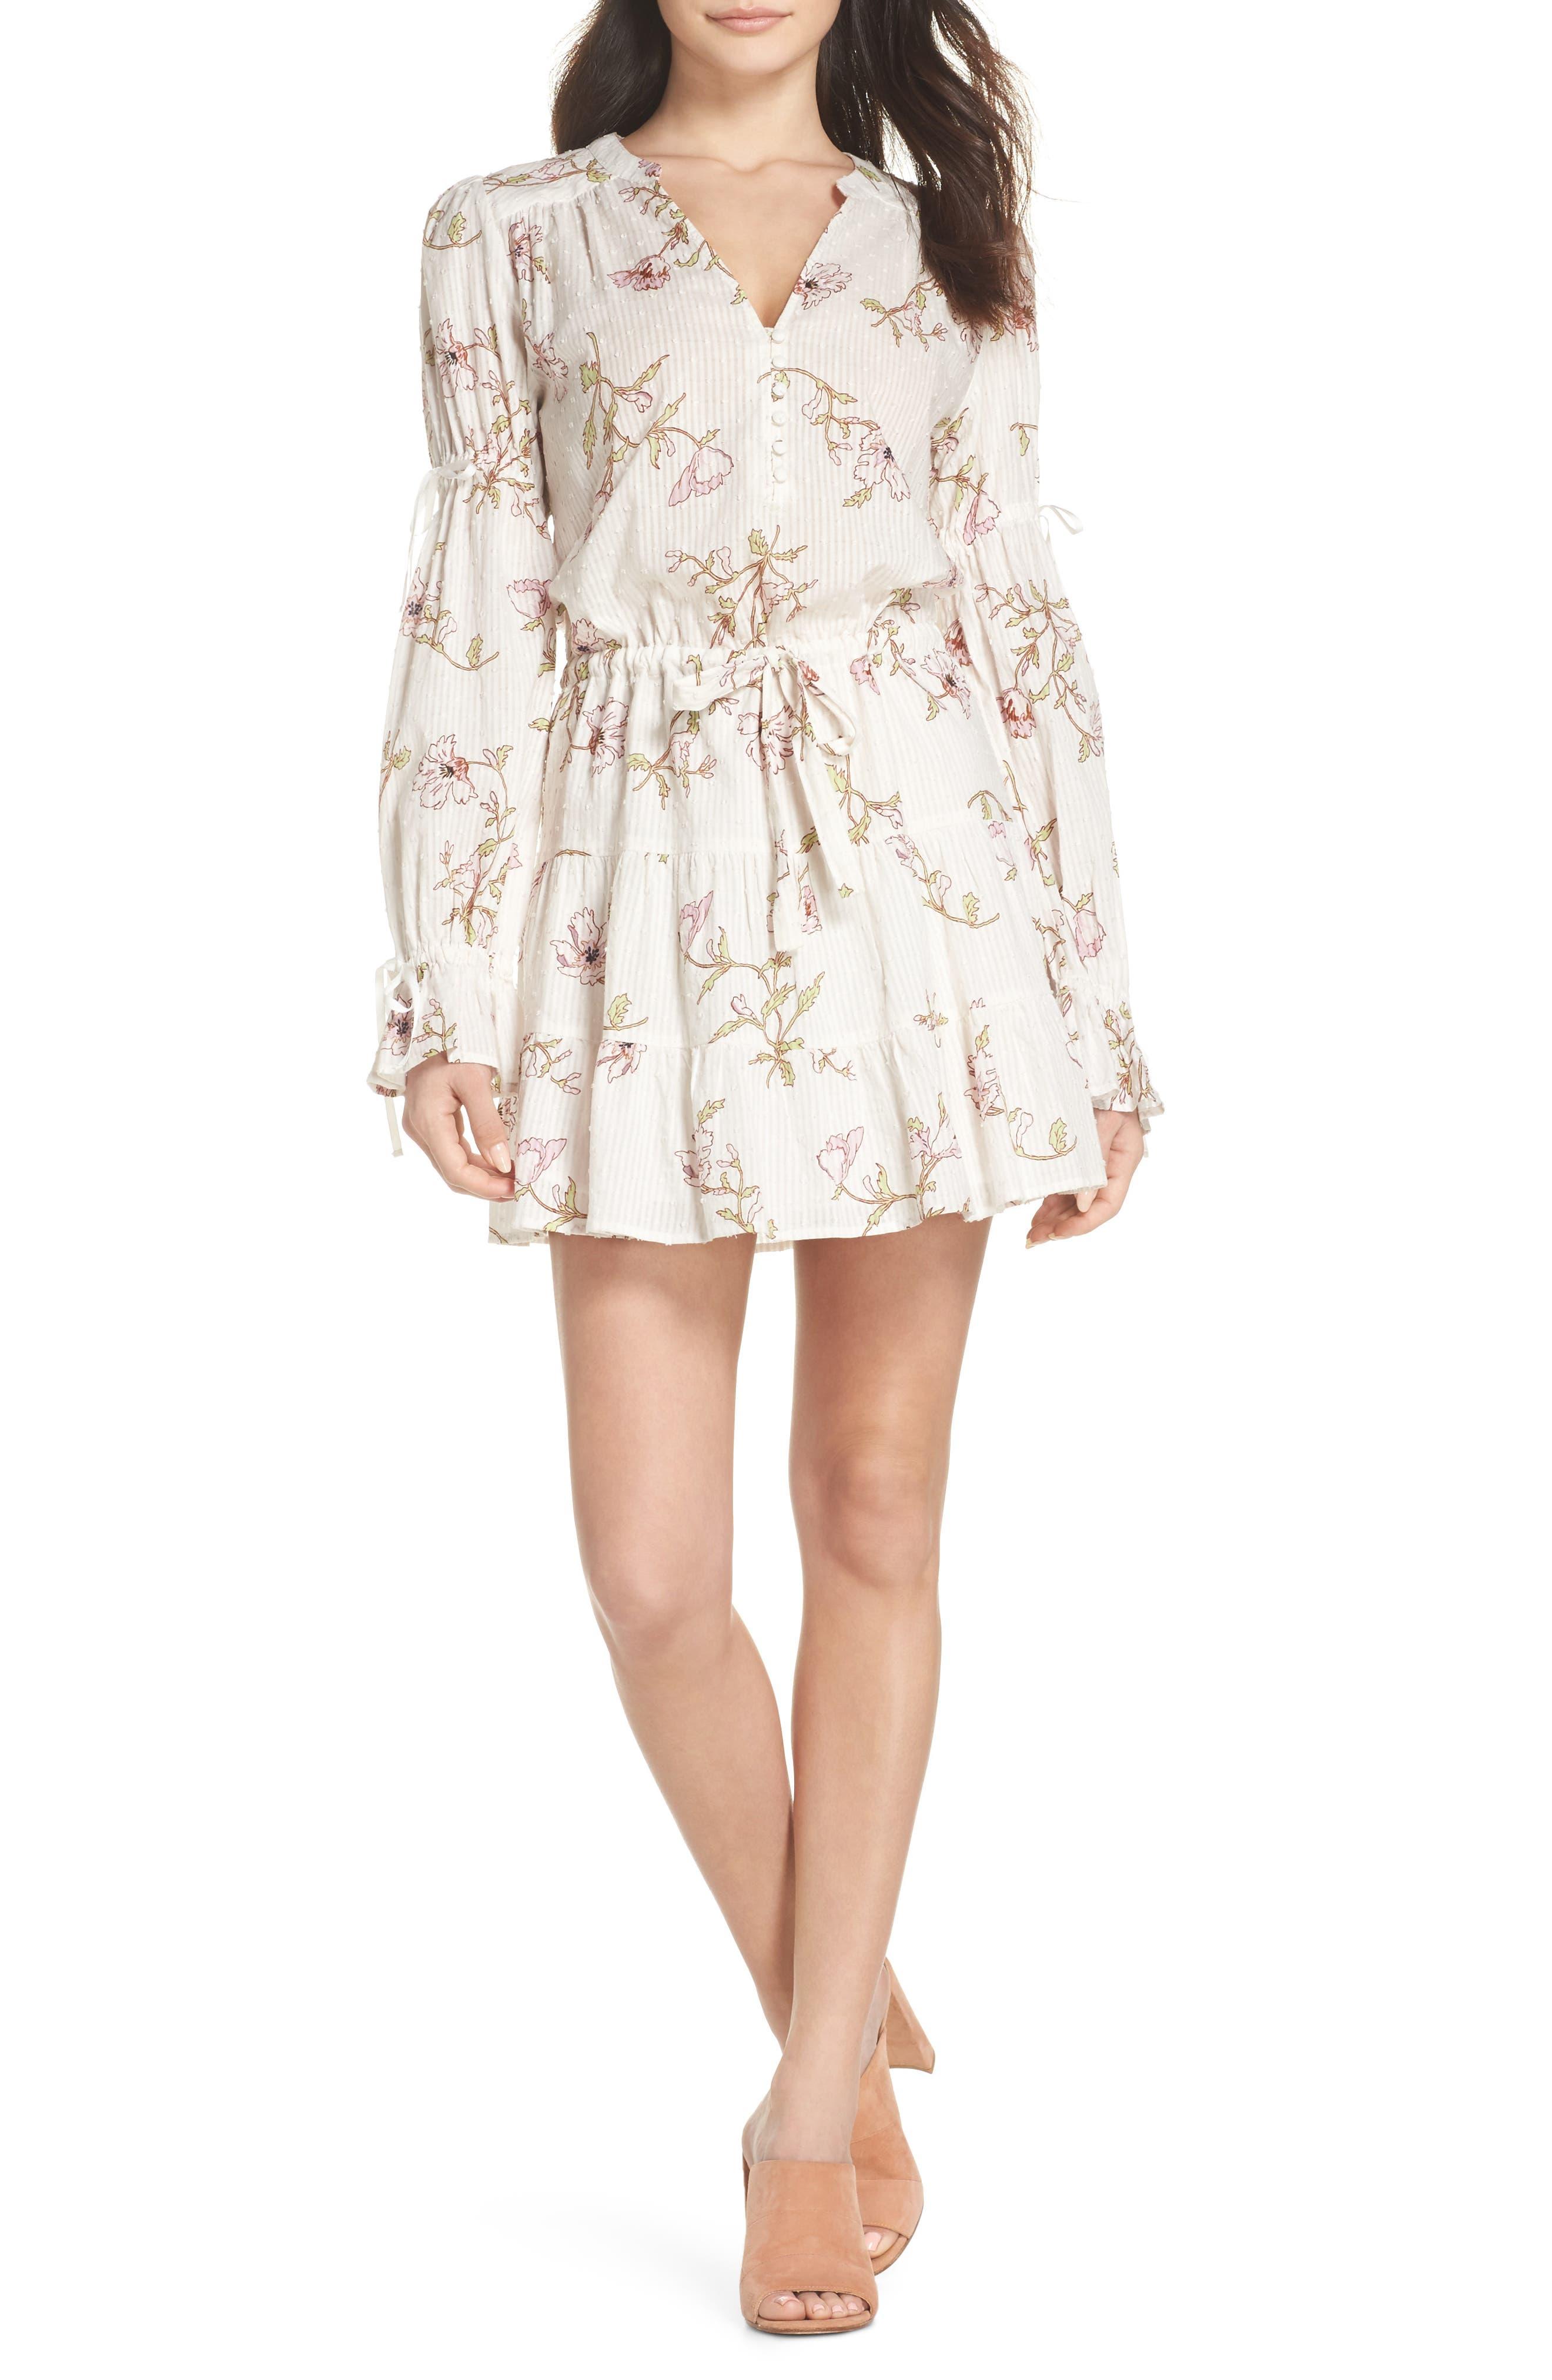 Yardley Floral Minidress,                         Main,                         color, WHITE / MAUVE SHADOWS